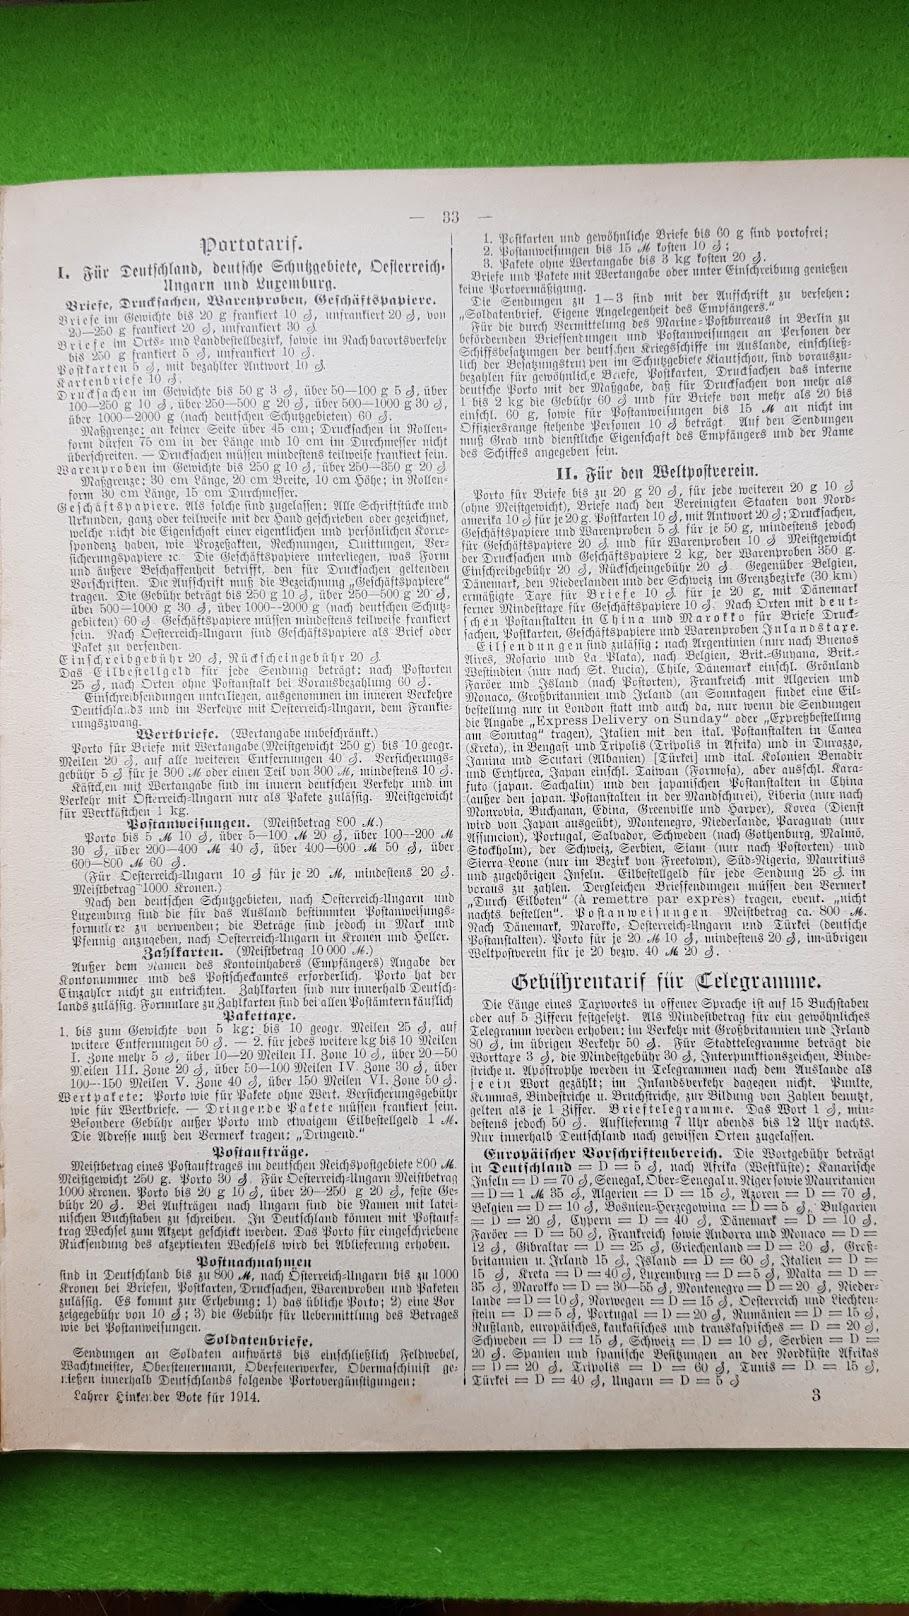 Großer Volkskalender des Lahrer hinkenden Boten - 1914 - Posttarife, Porto